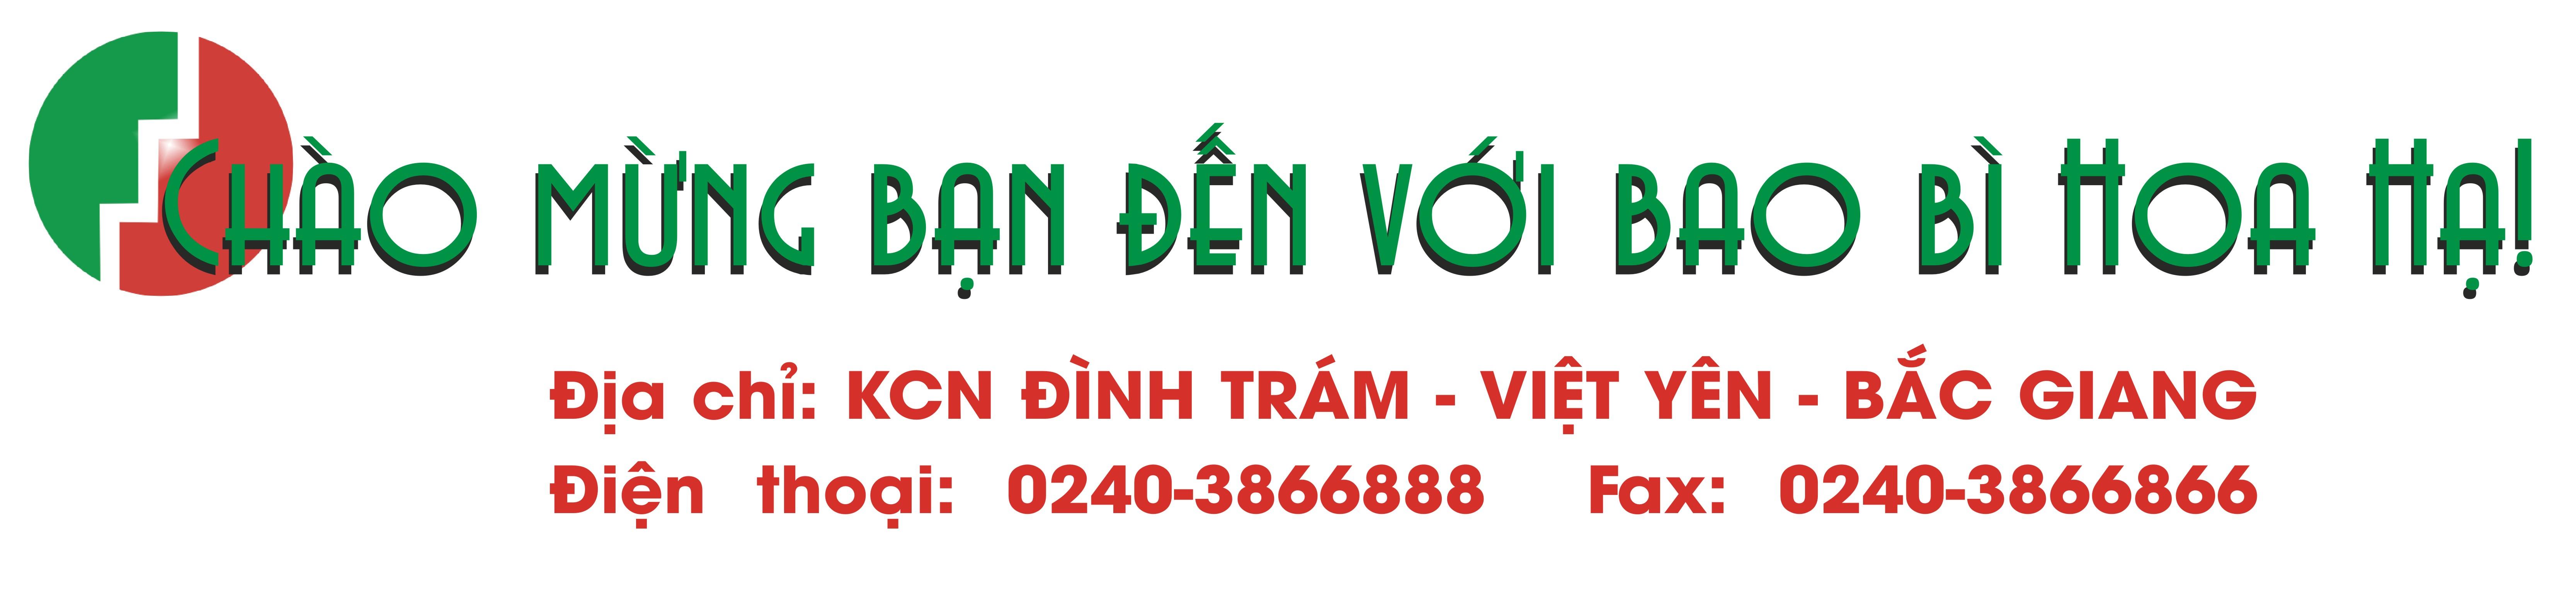 http://vietnamhoaha.com.vn